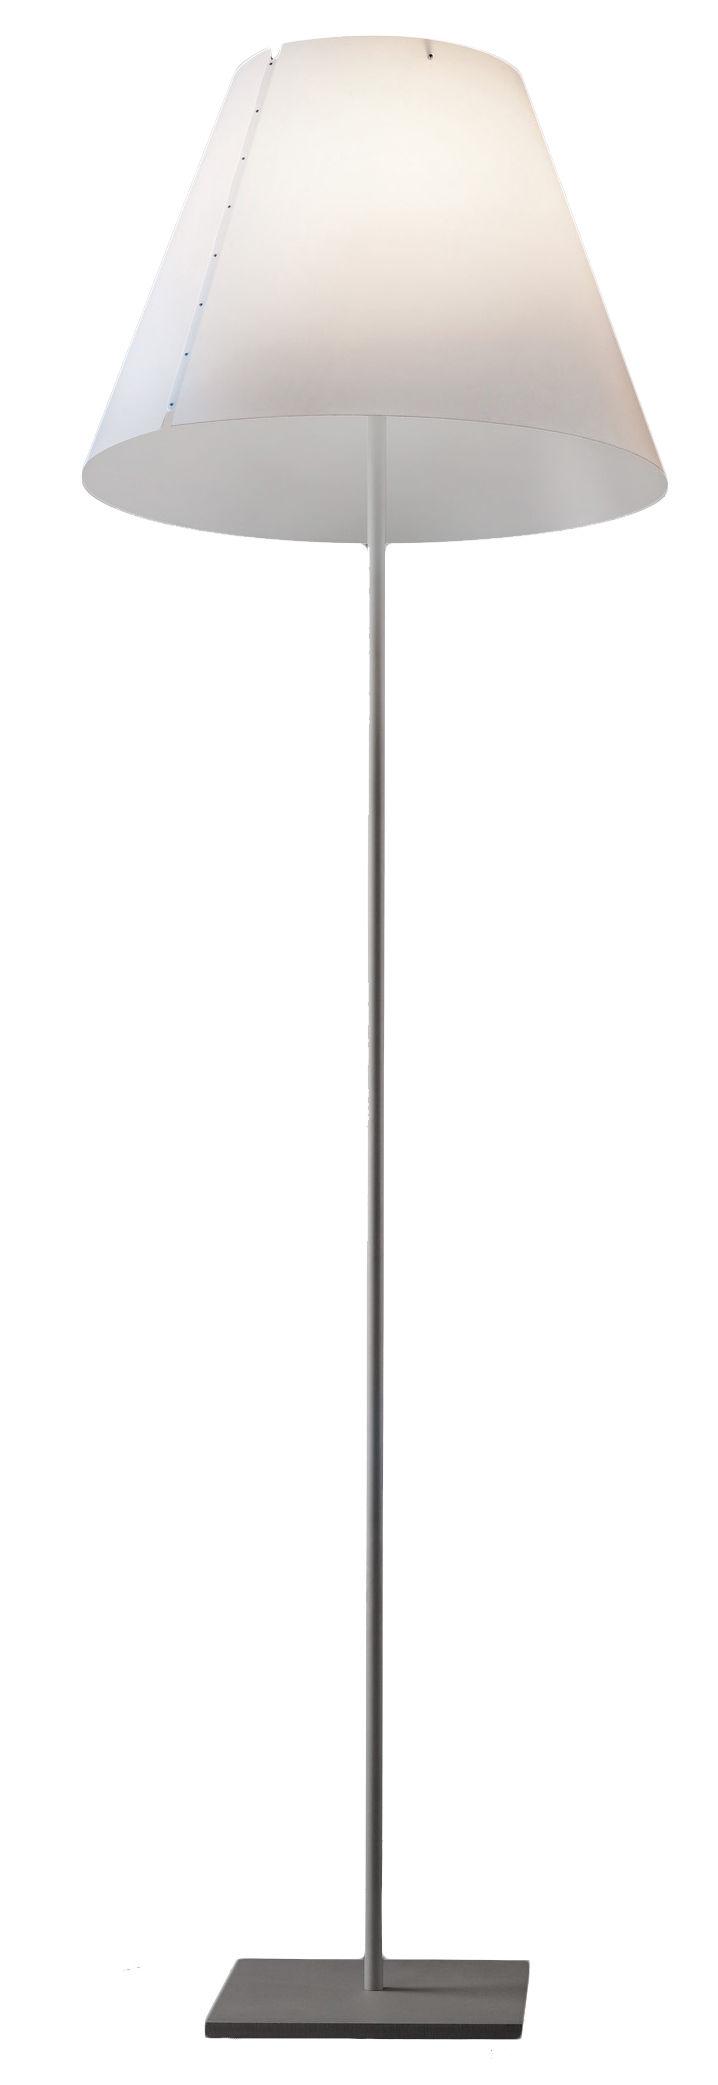 Lighting - Floor lamps - Grande Costanza Floor lamp by Luceplan - Alu / white - Aluminium